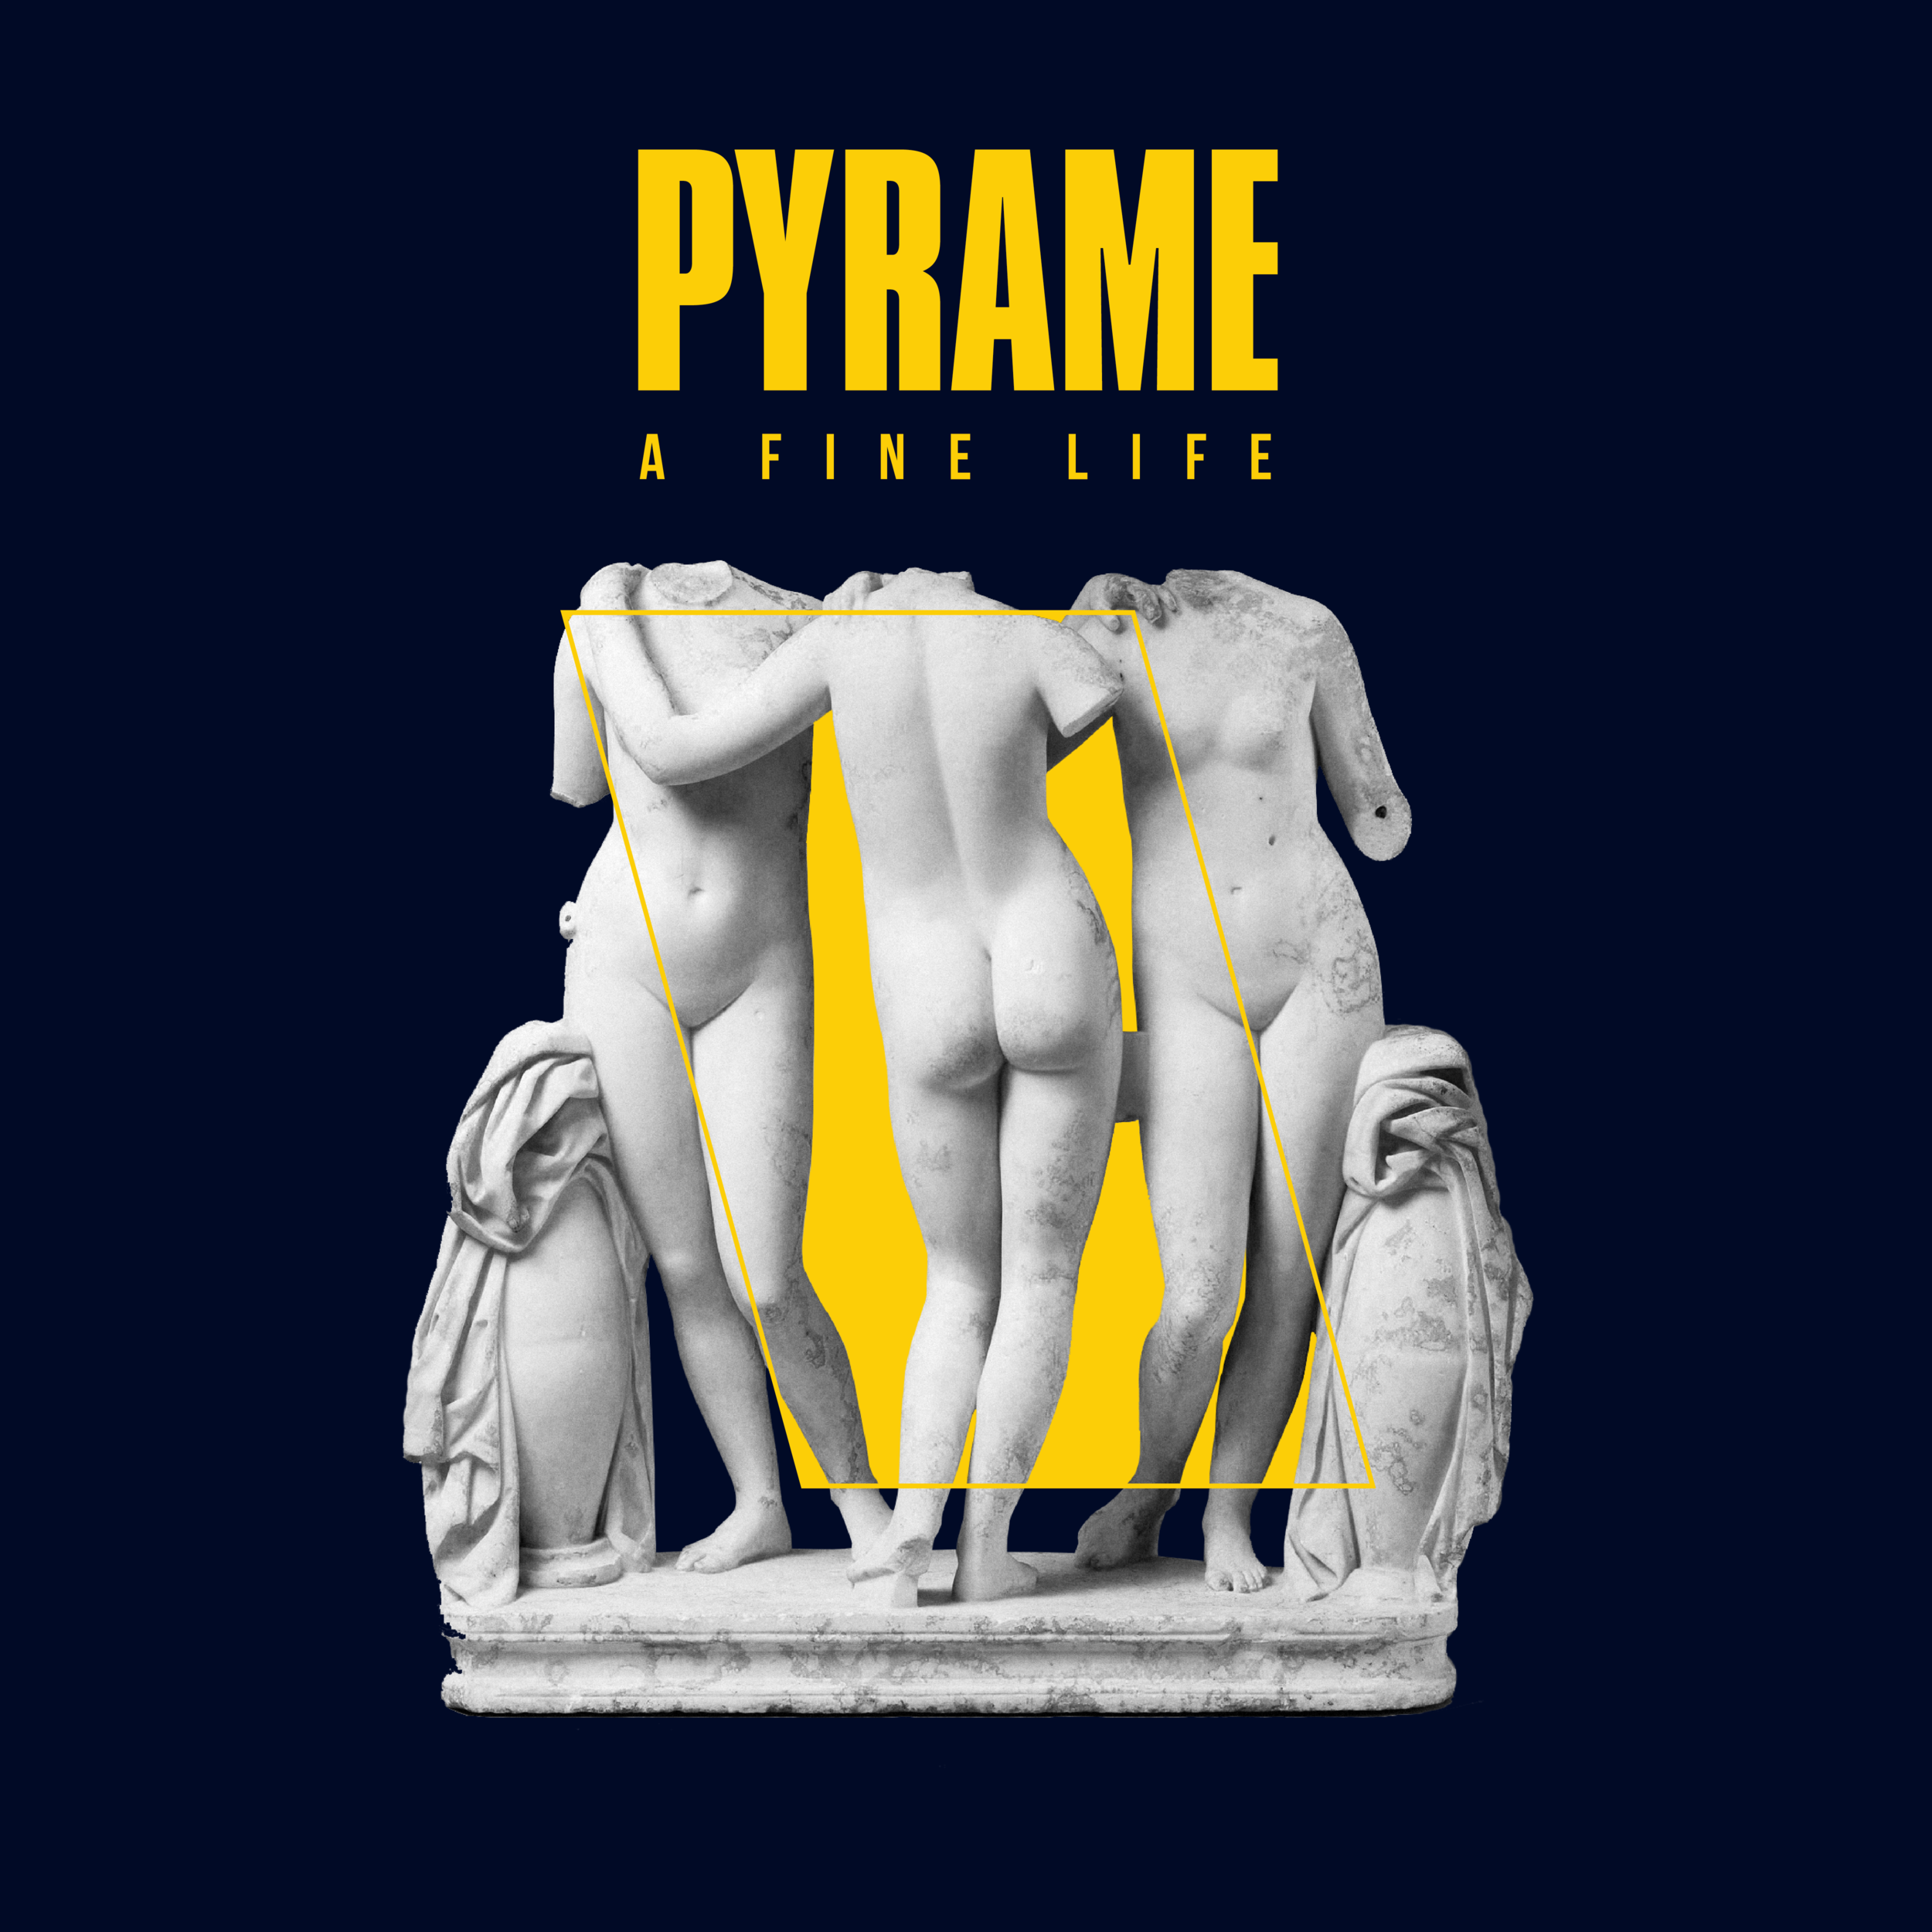 PYRAMEA Fine Life EP - Music Production & Mixing